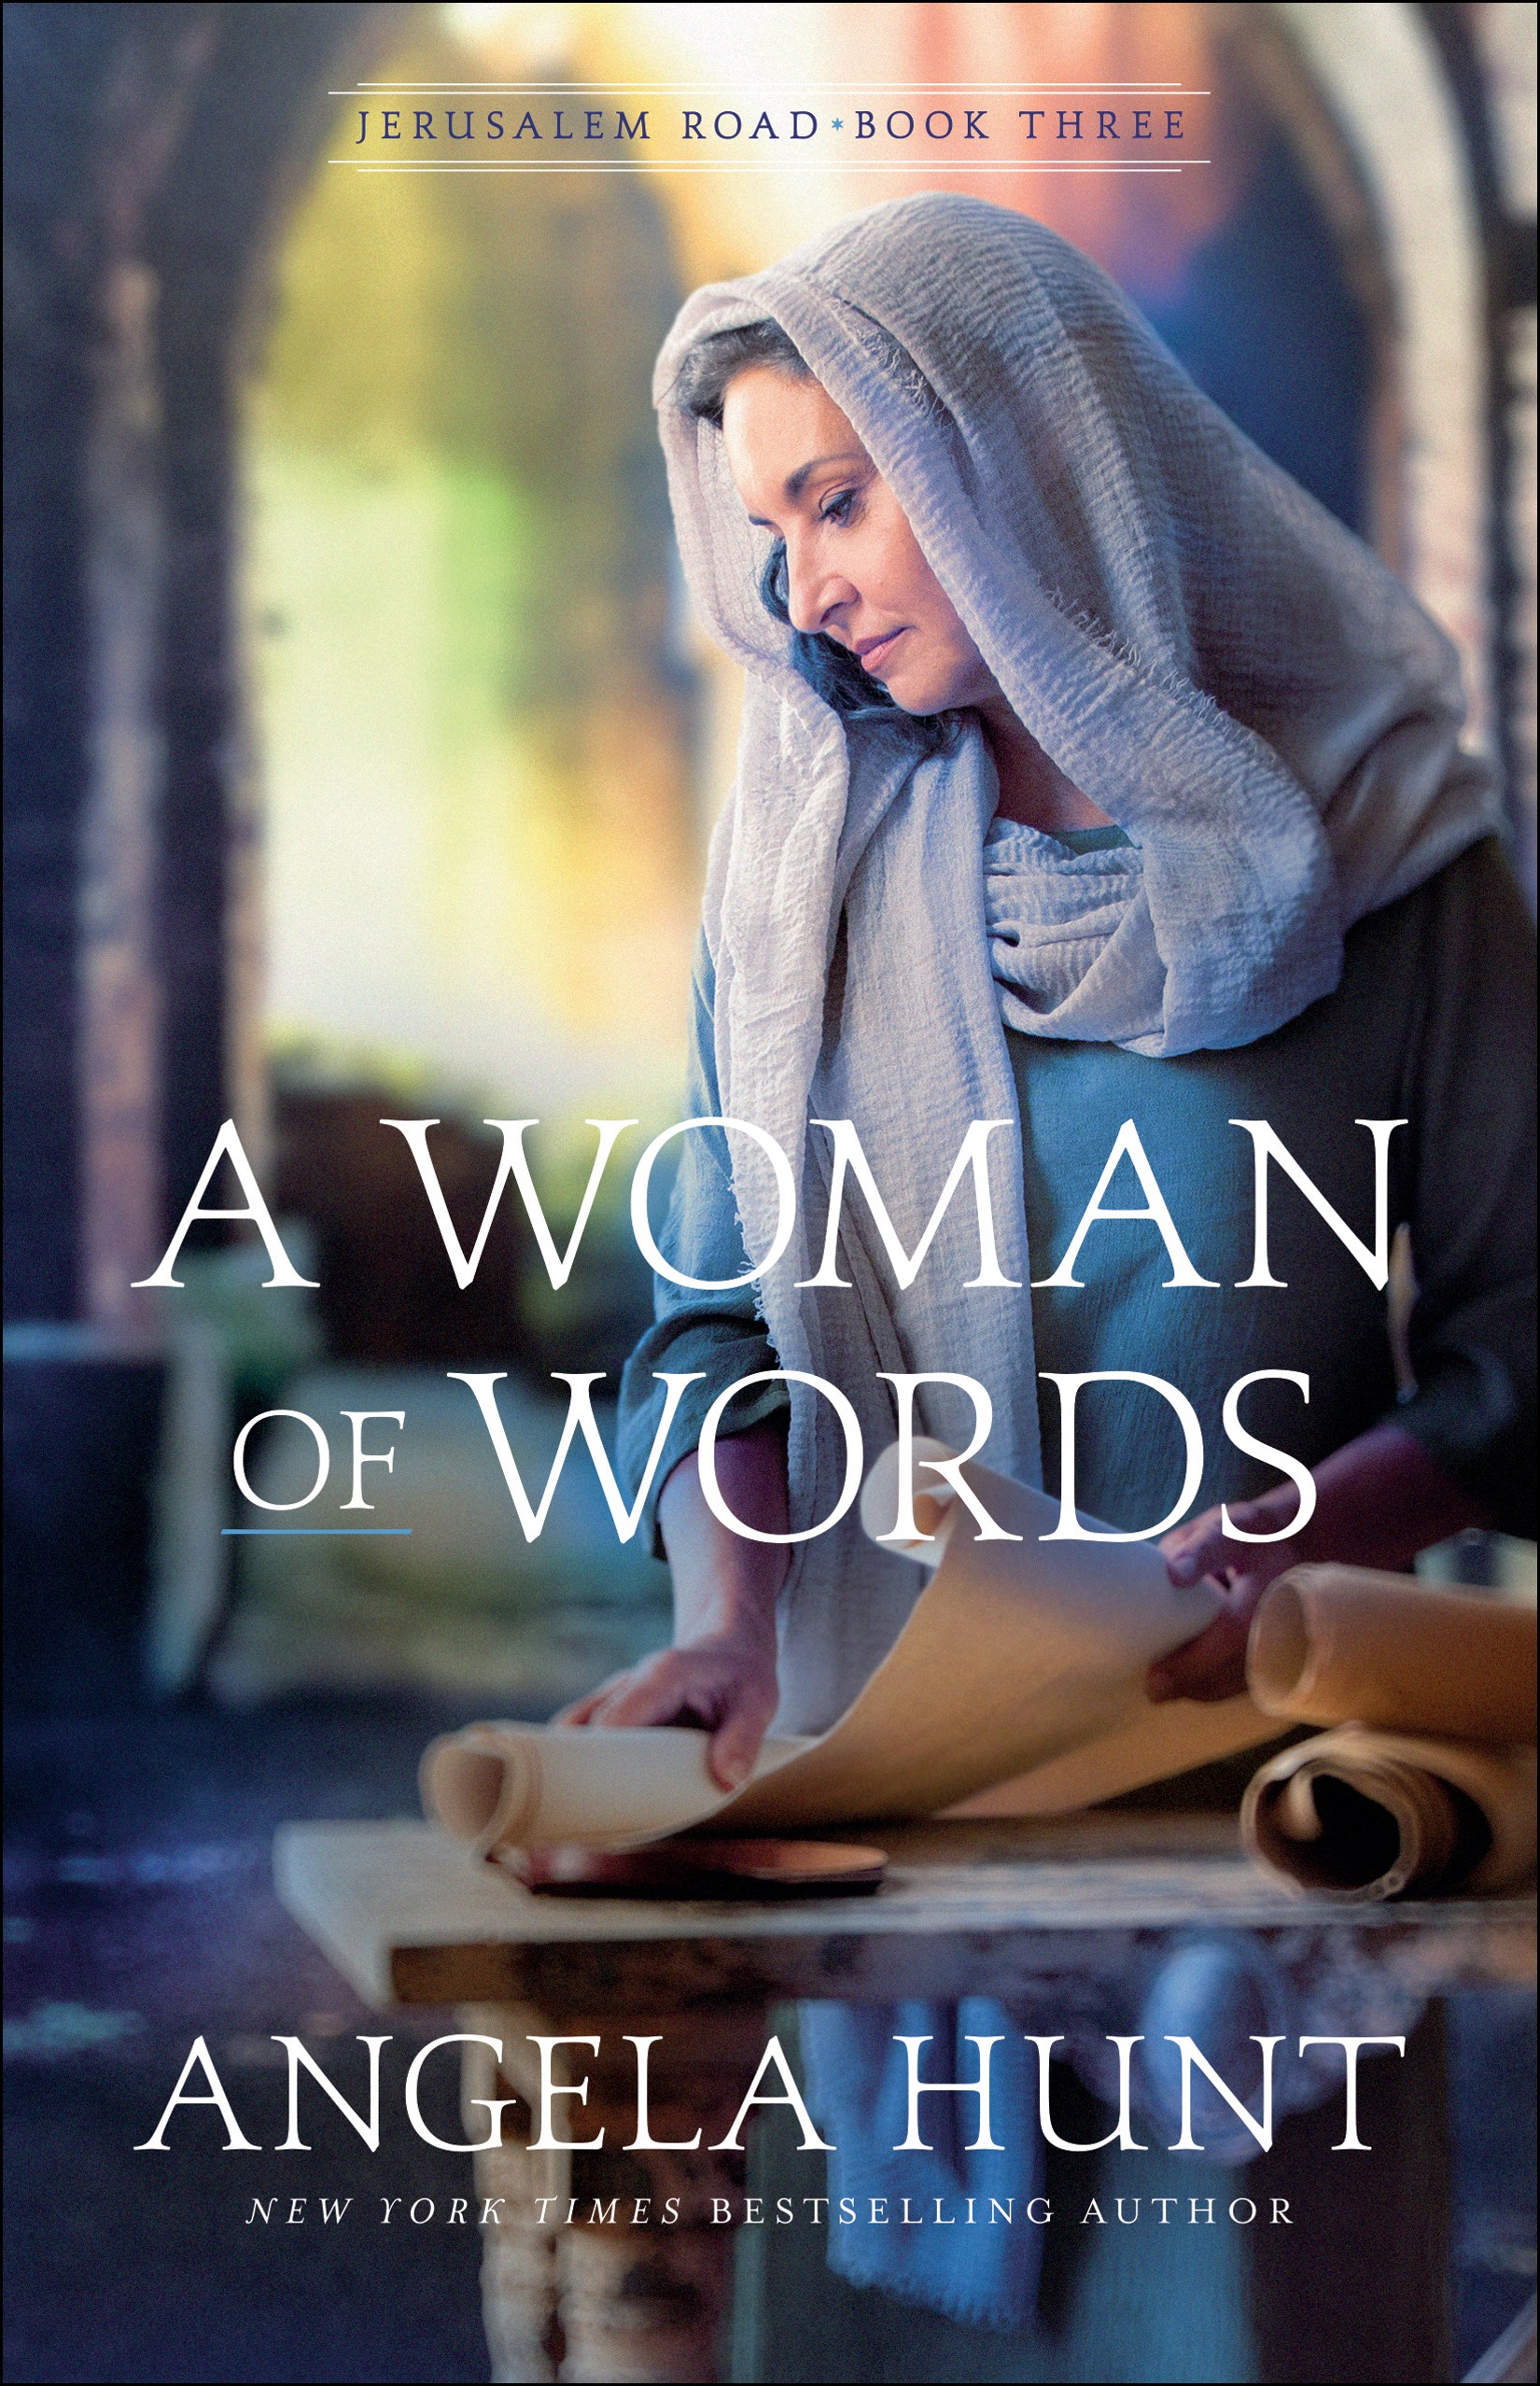 A Woman Of Words (Jerusalem Road #3)